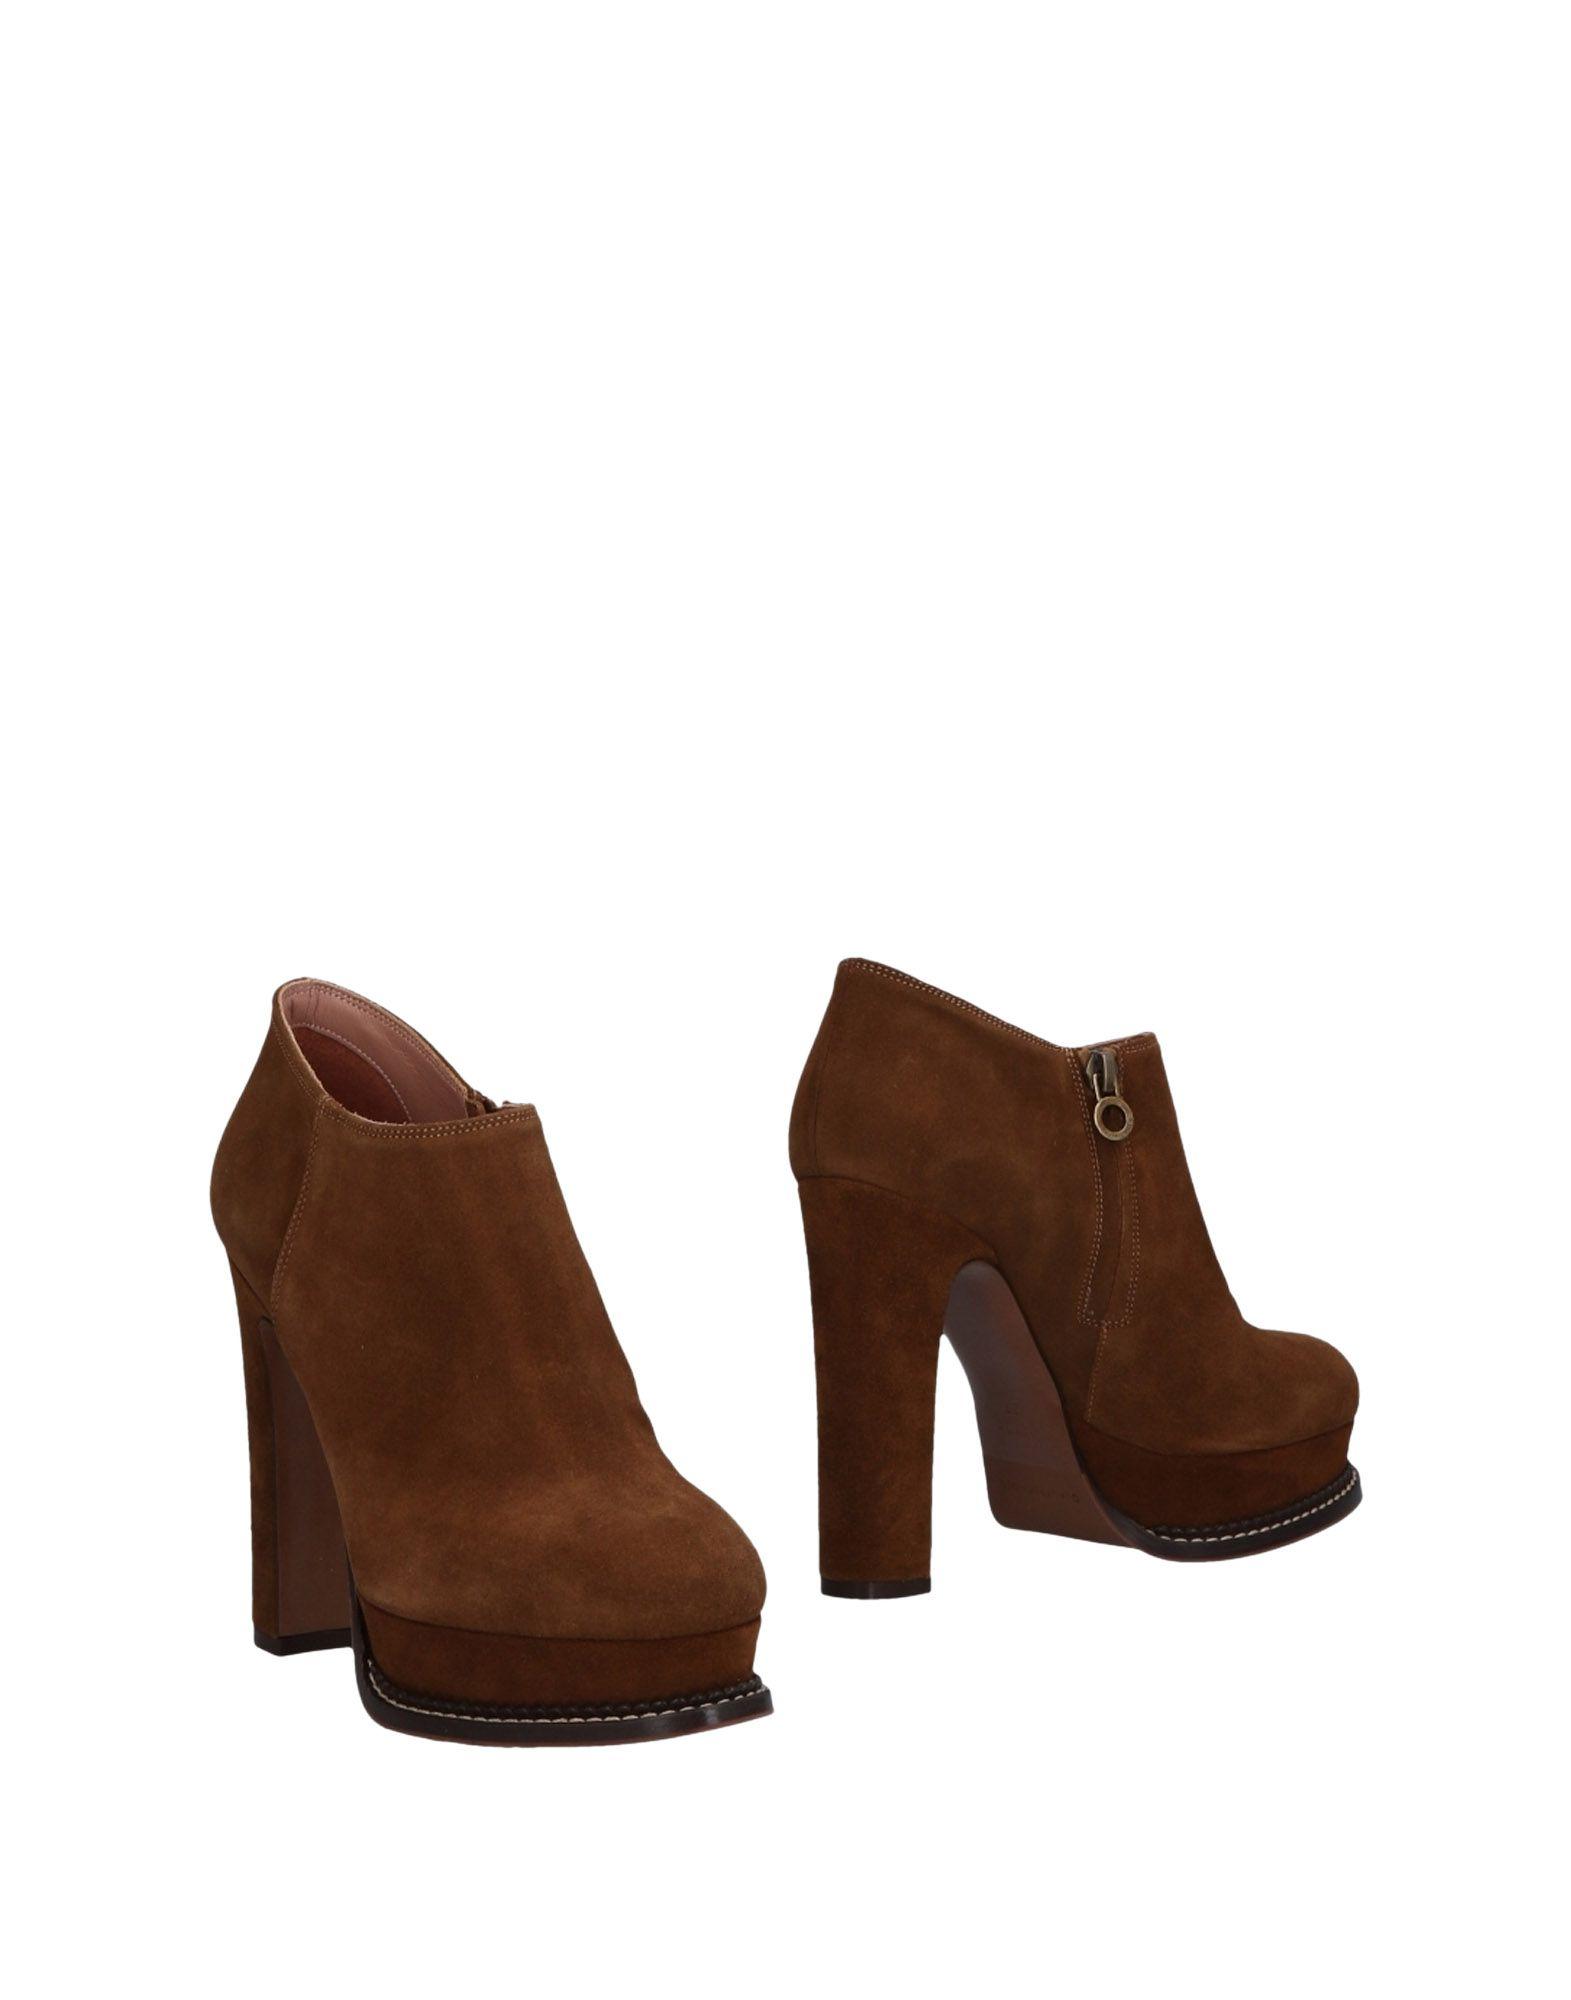 L' Autre Chose Stiefelette Damen  11474545OQGut aussehende strapazierfähige Schuhe